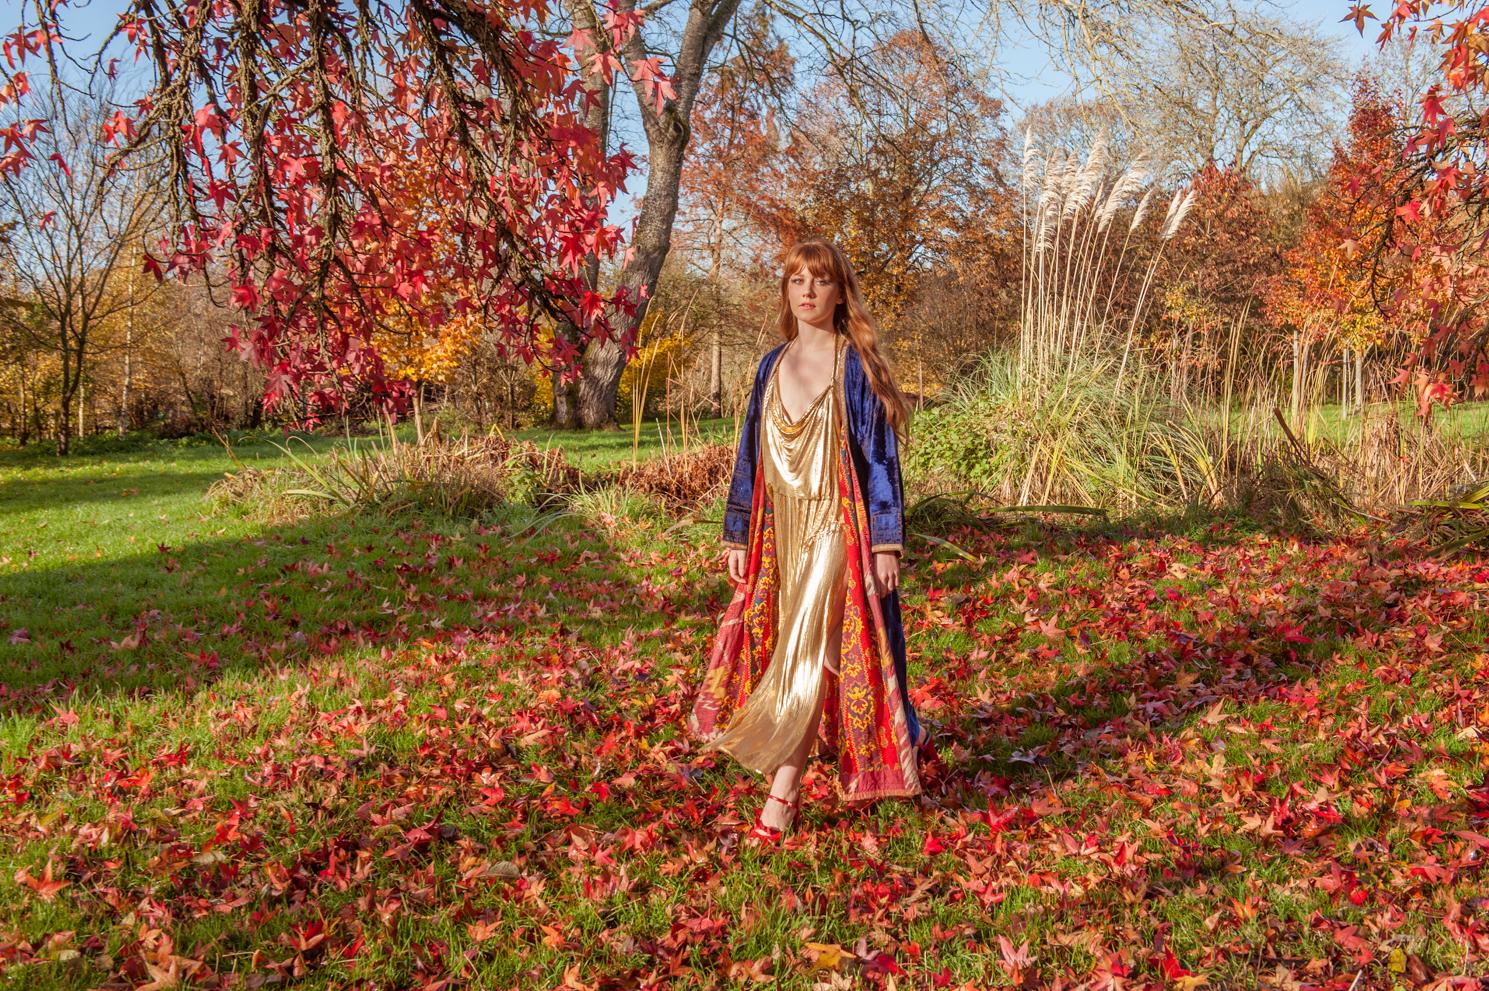 Autumn days. Hannah Chinn in gold by Farnham, Surrey based portrait and fashion photographer James Muller